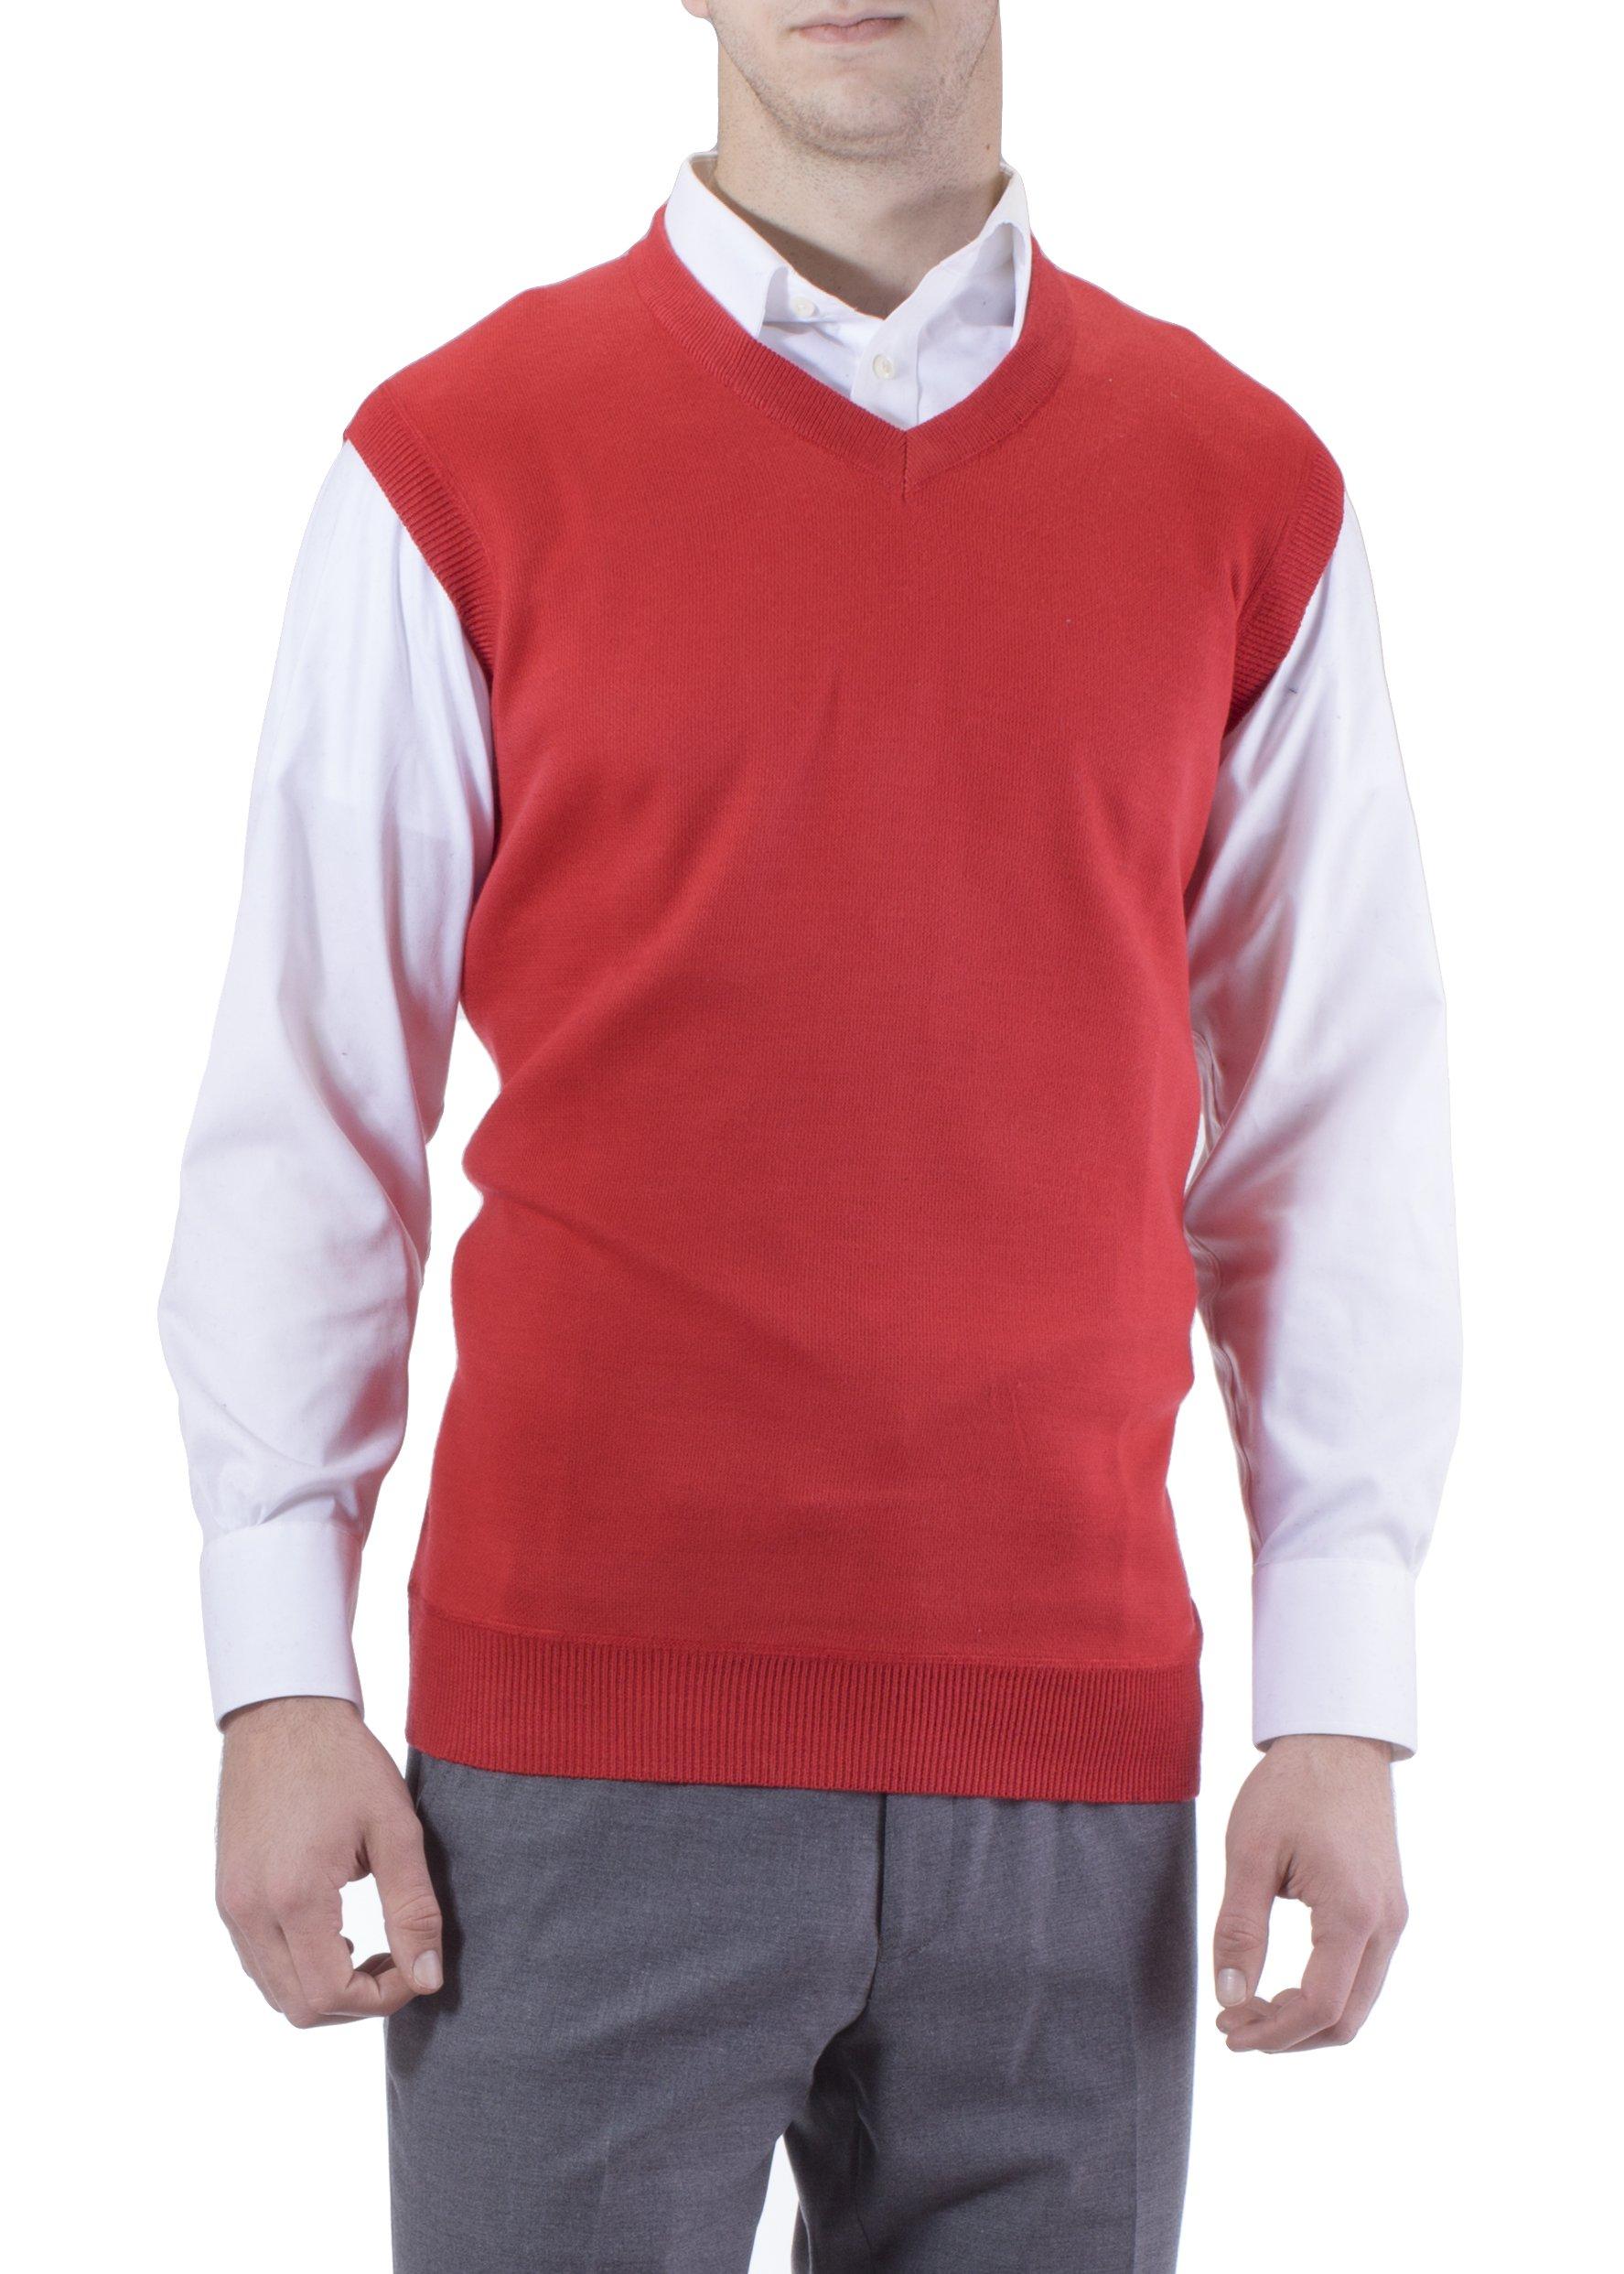 Alberto Cardinali Men's Solid Color V-Neck Sweater Vest SVS1 SVS1 (Large, Red) by Alberto Cardinali